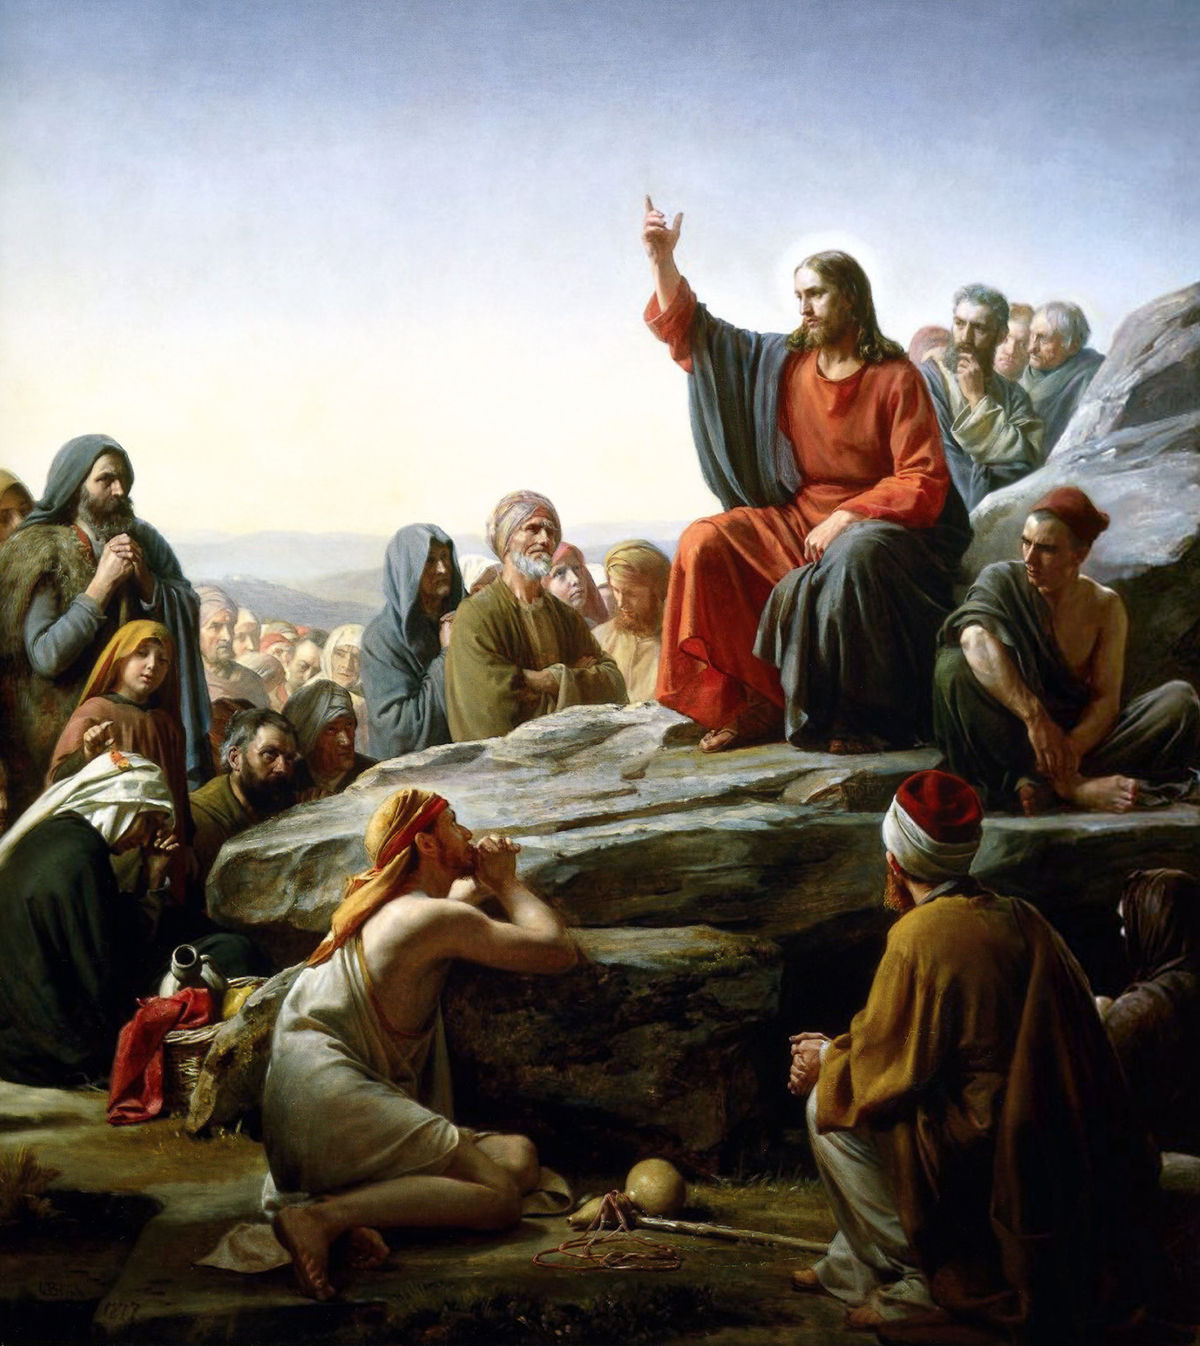 2018-03-10 Image - Sermon on the Mount.jpg